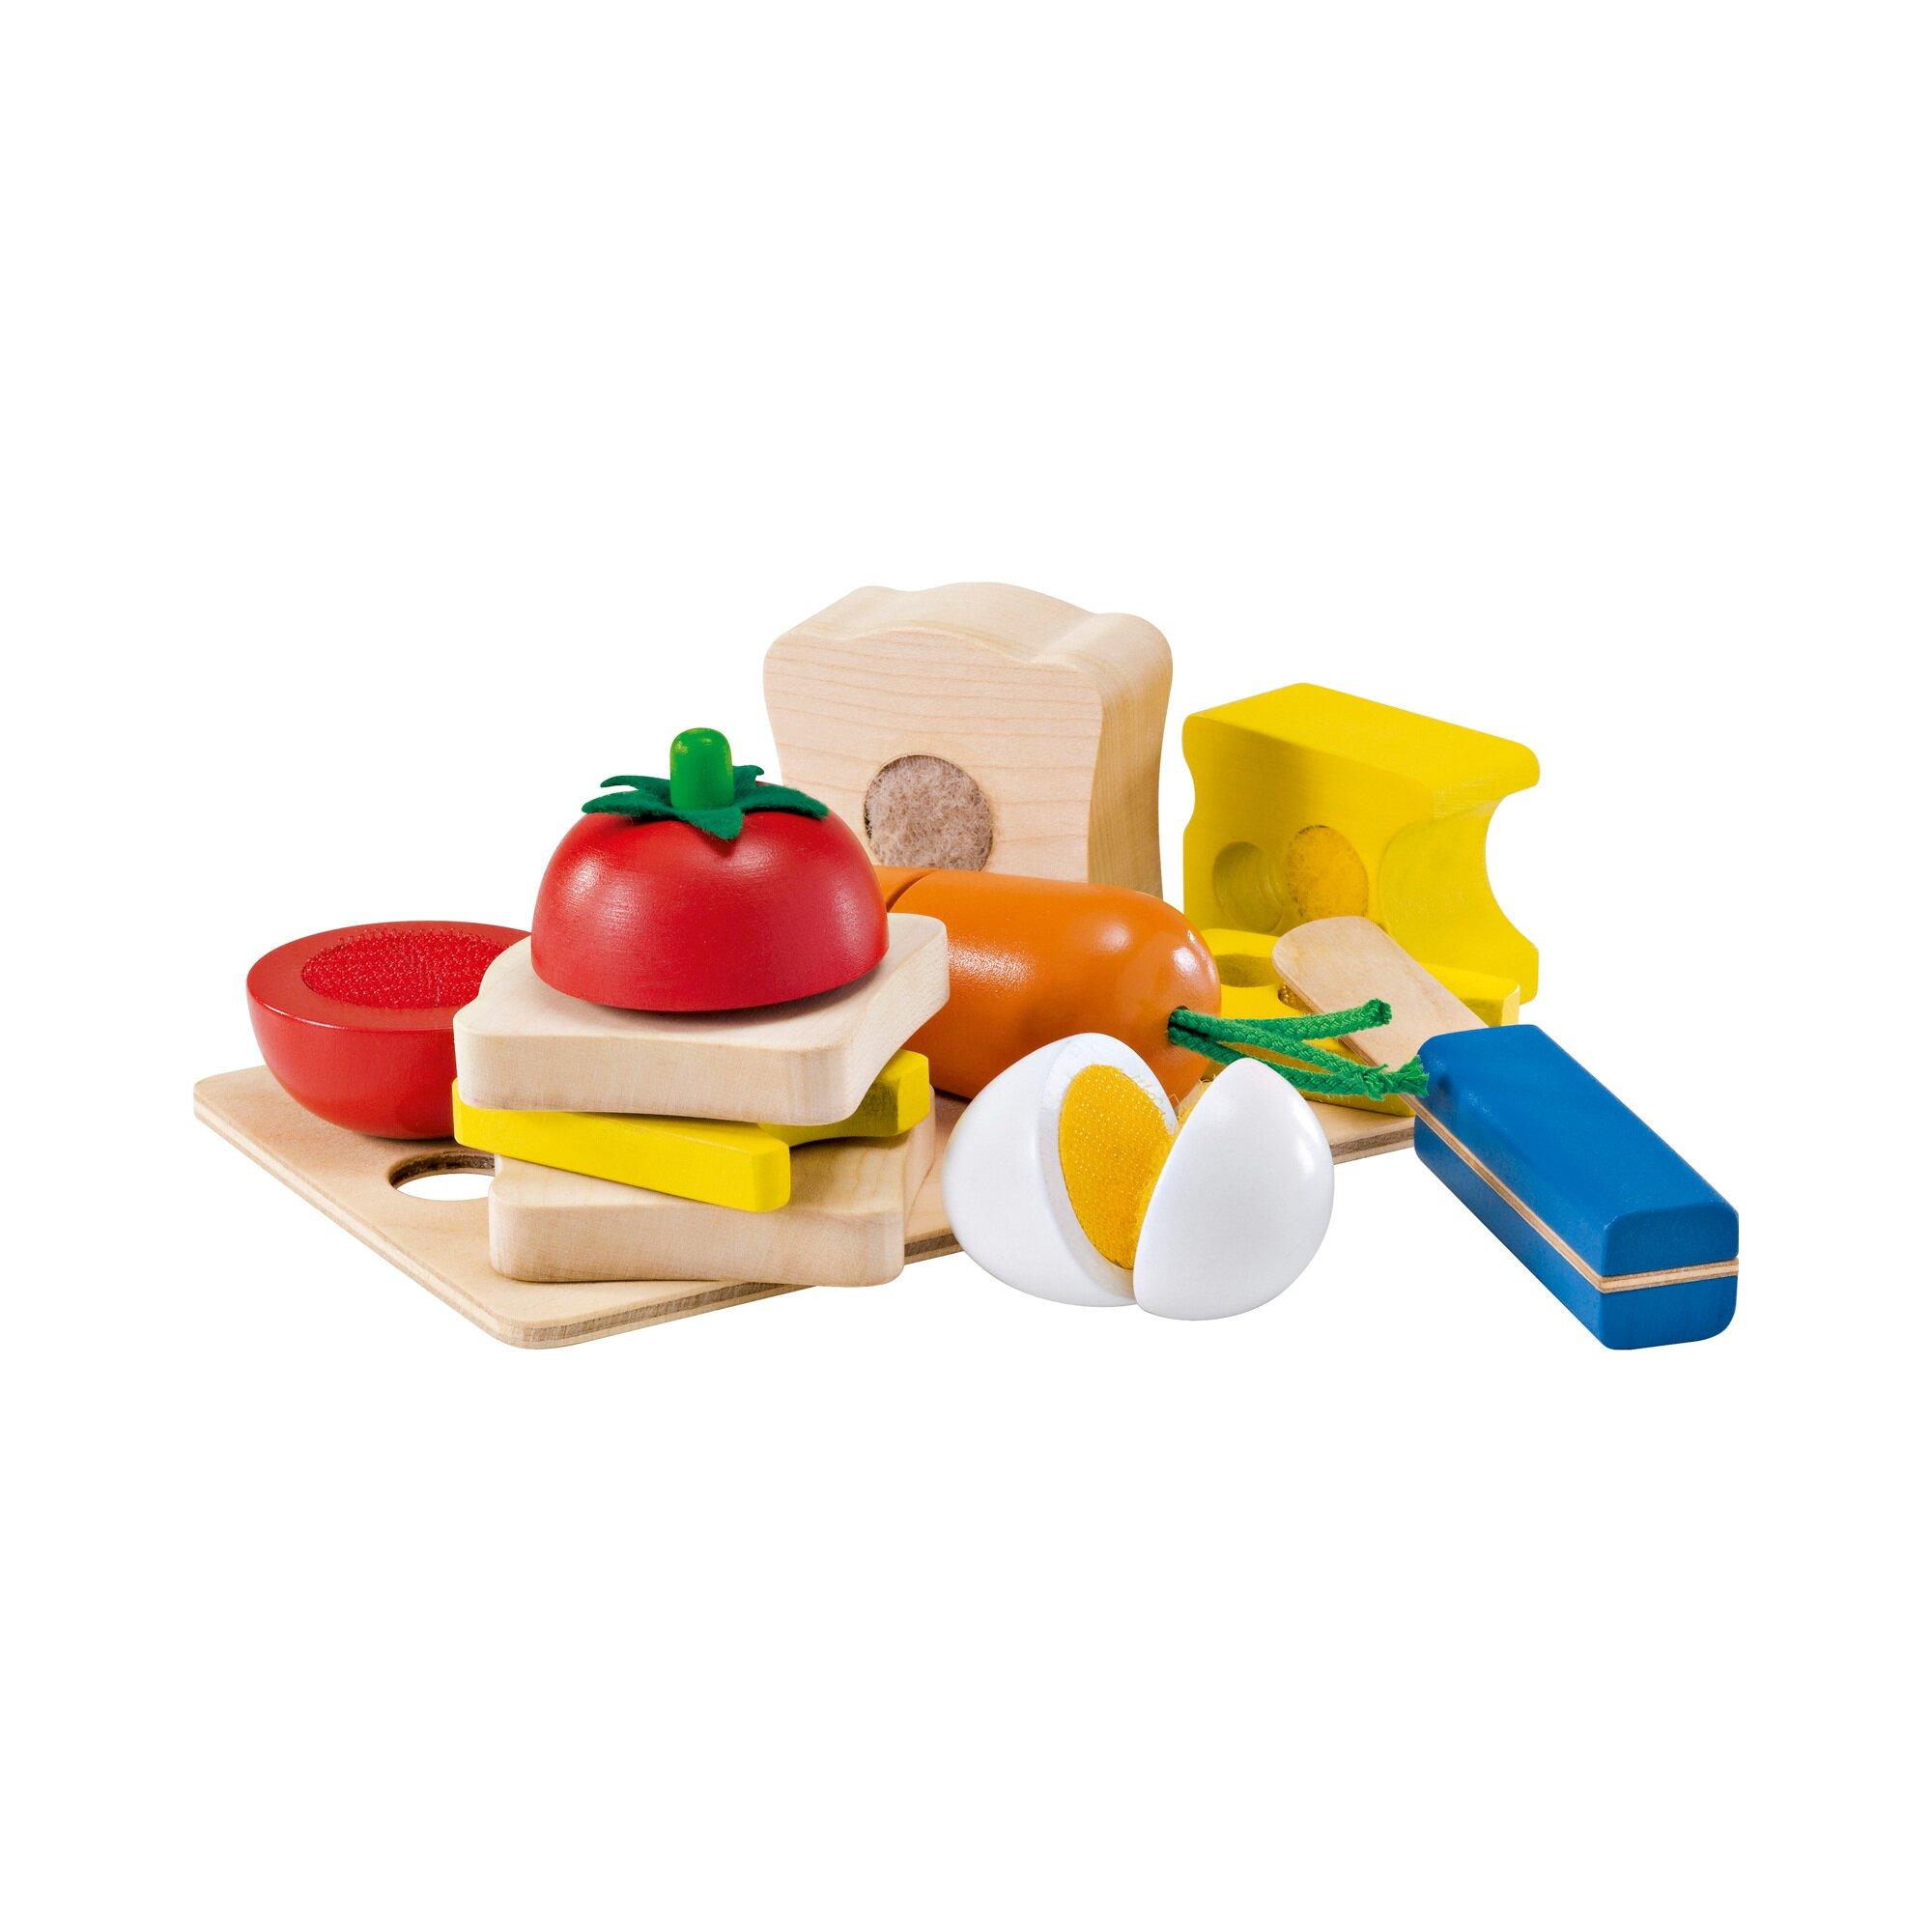 selecta-schneide-set-picknick-14-teile